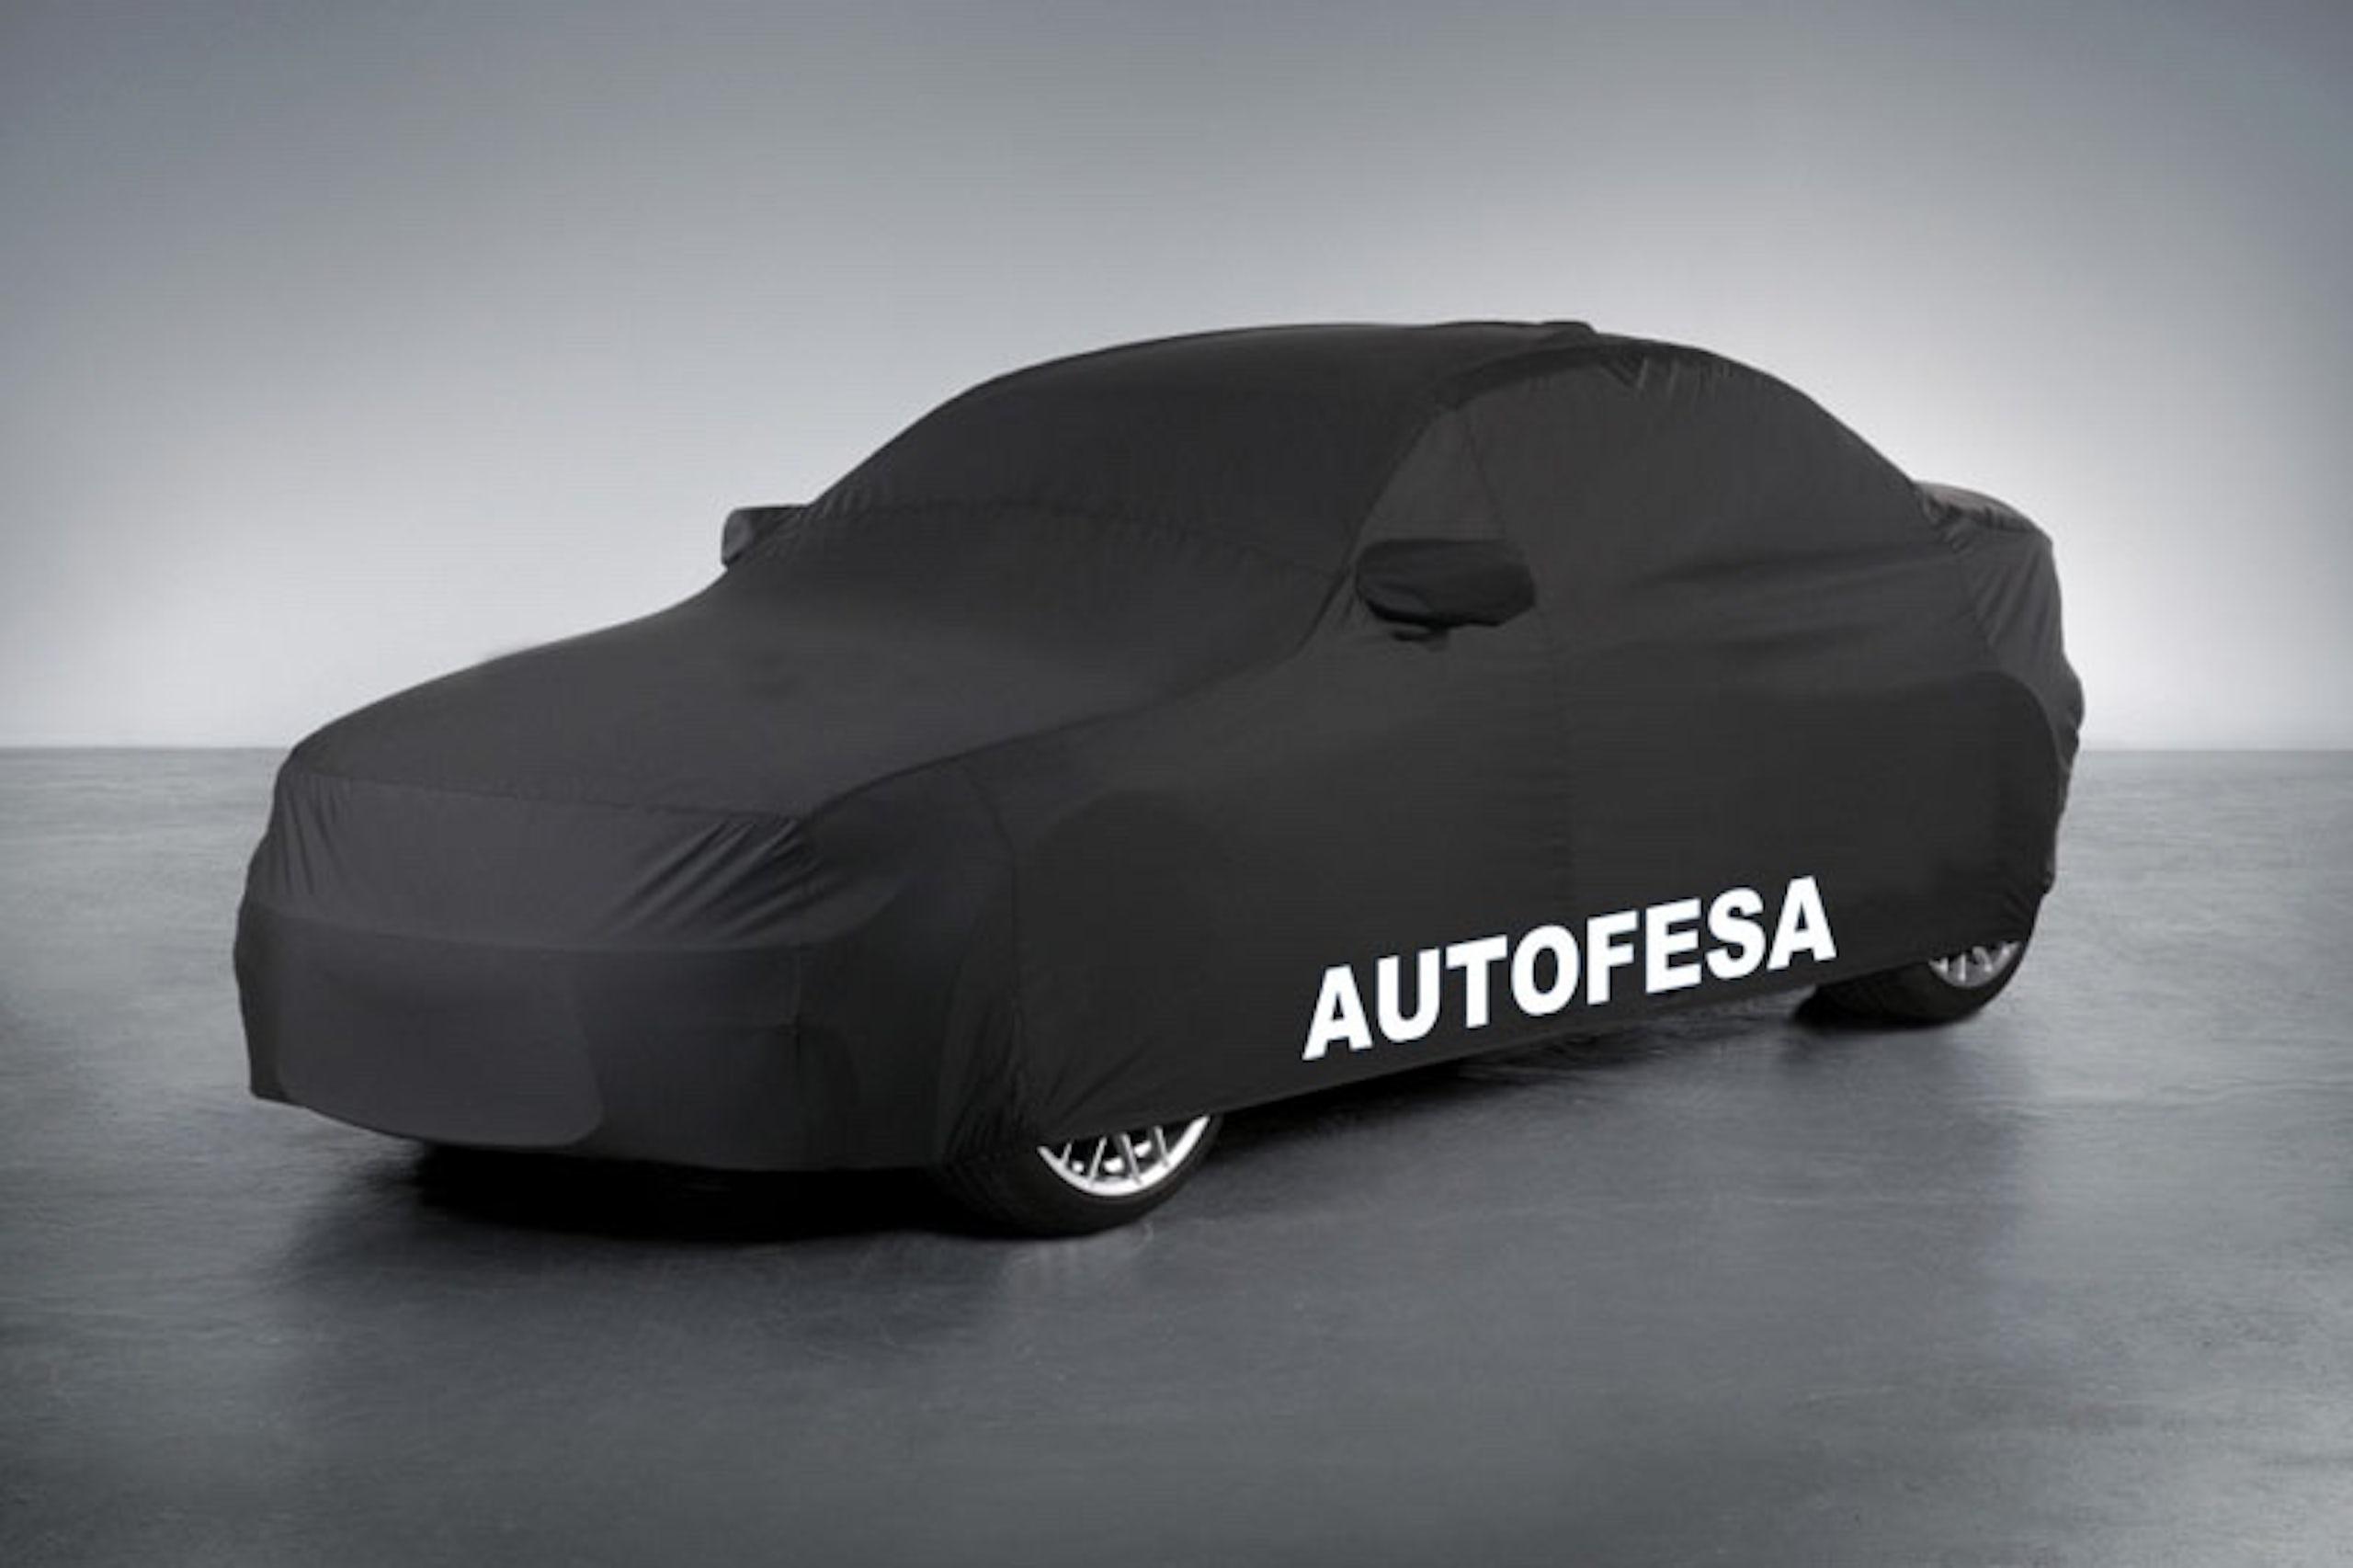 Audi Q5 2.0 TDI 170cv quattro 5p S tronic Auto - Foto 33